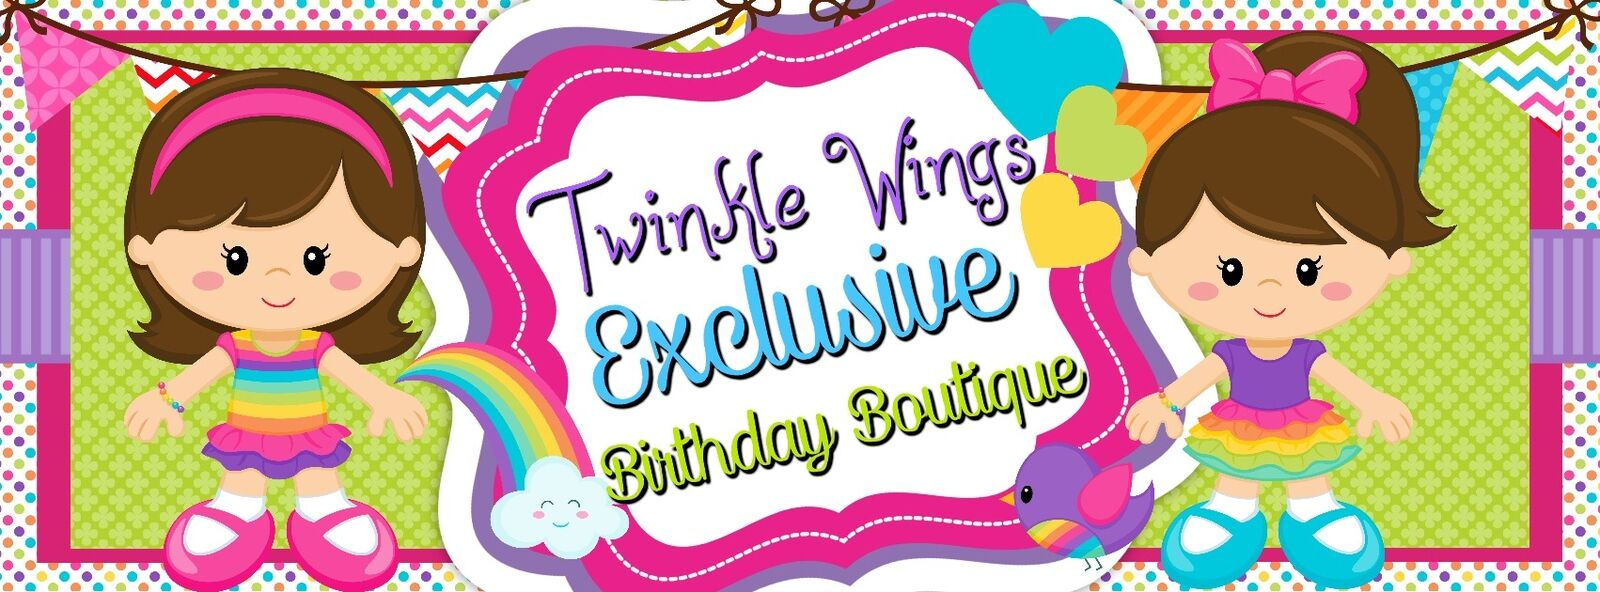 Twinkle Wings